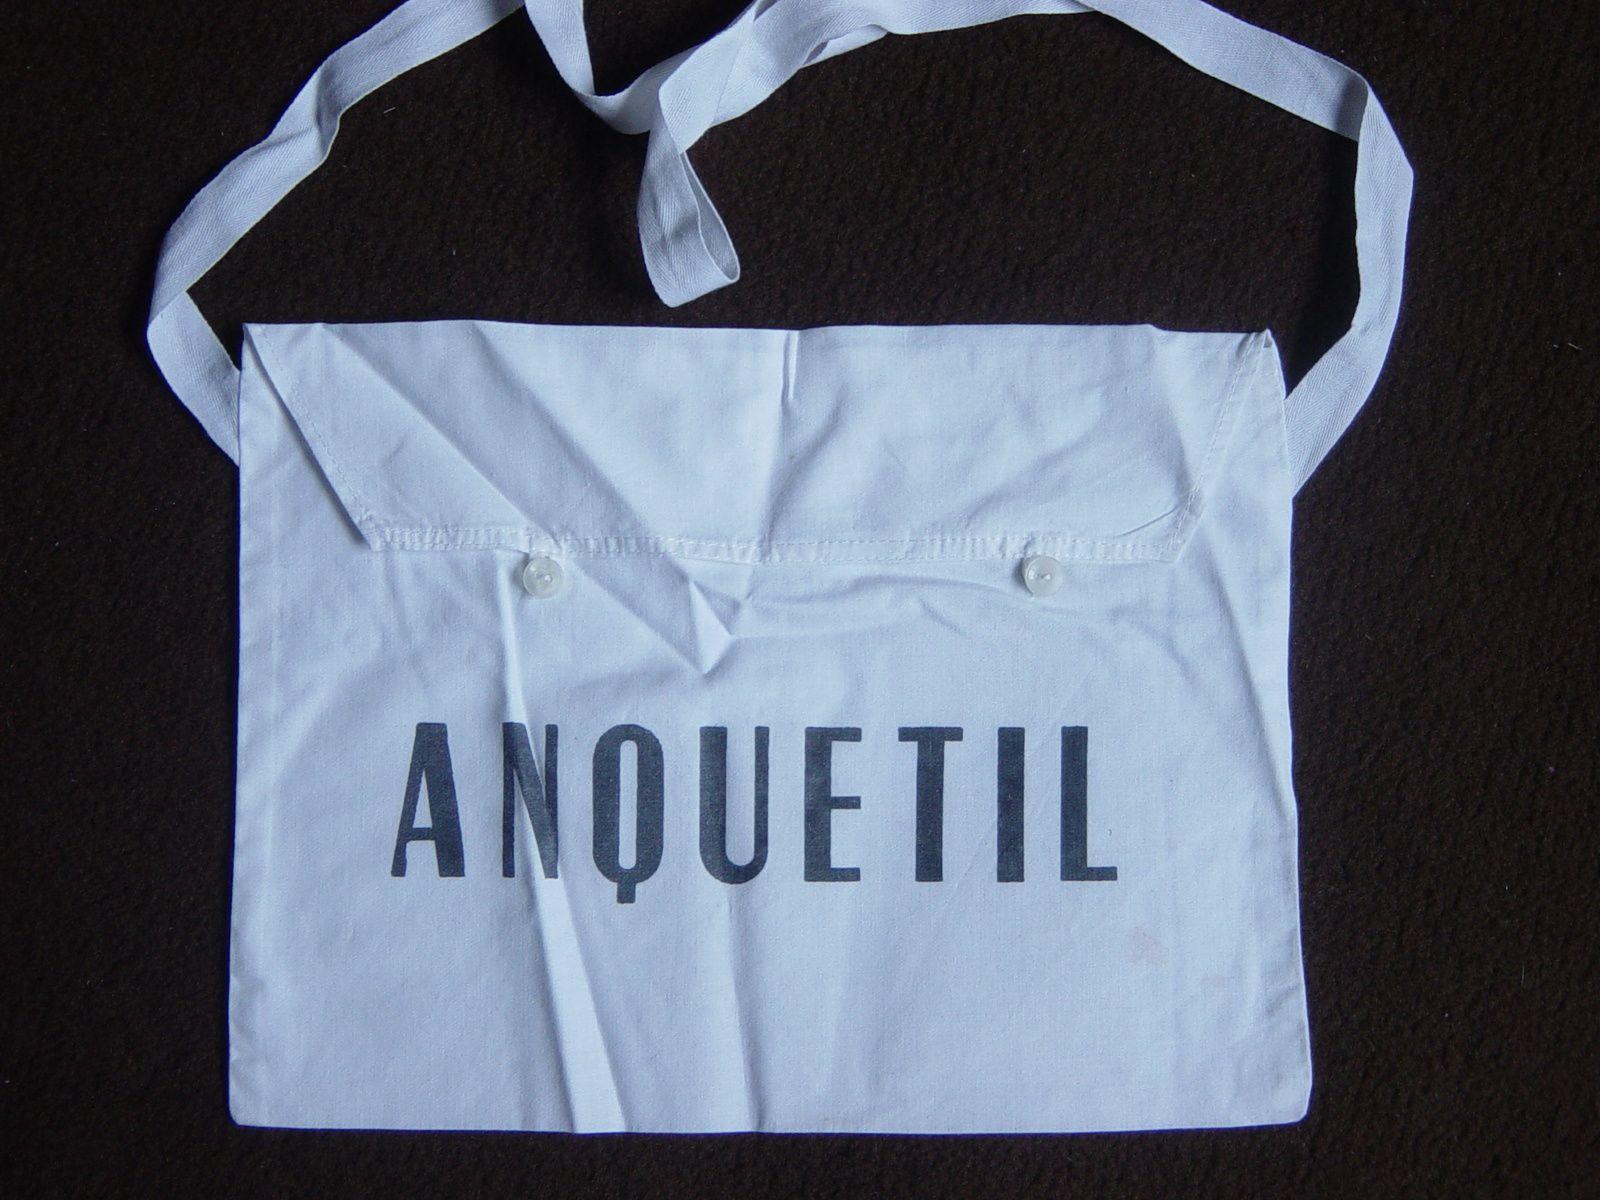 J.Anquetil 1966.